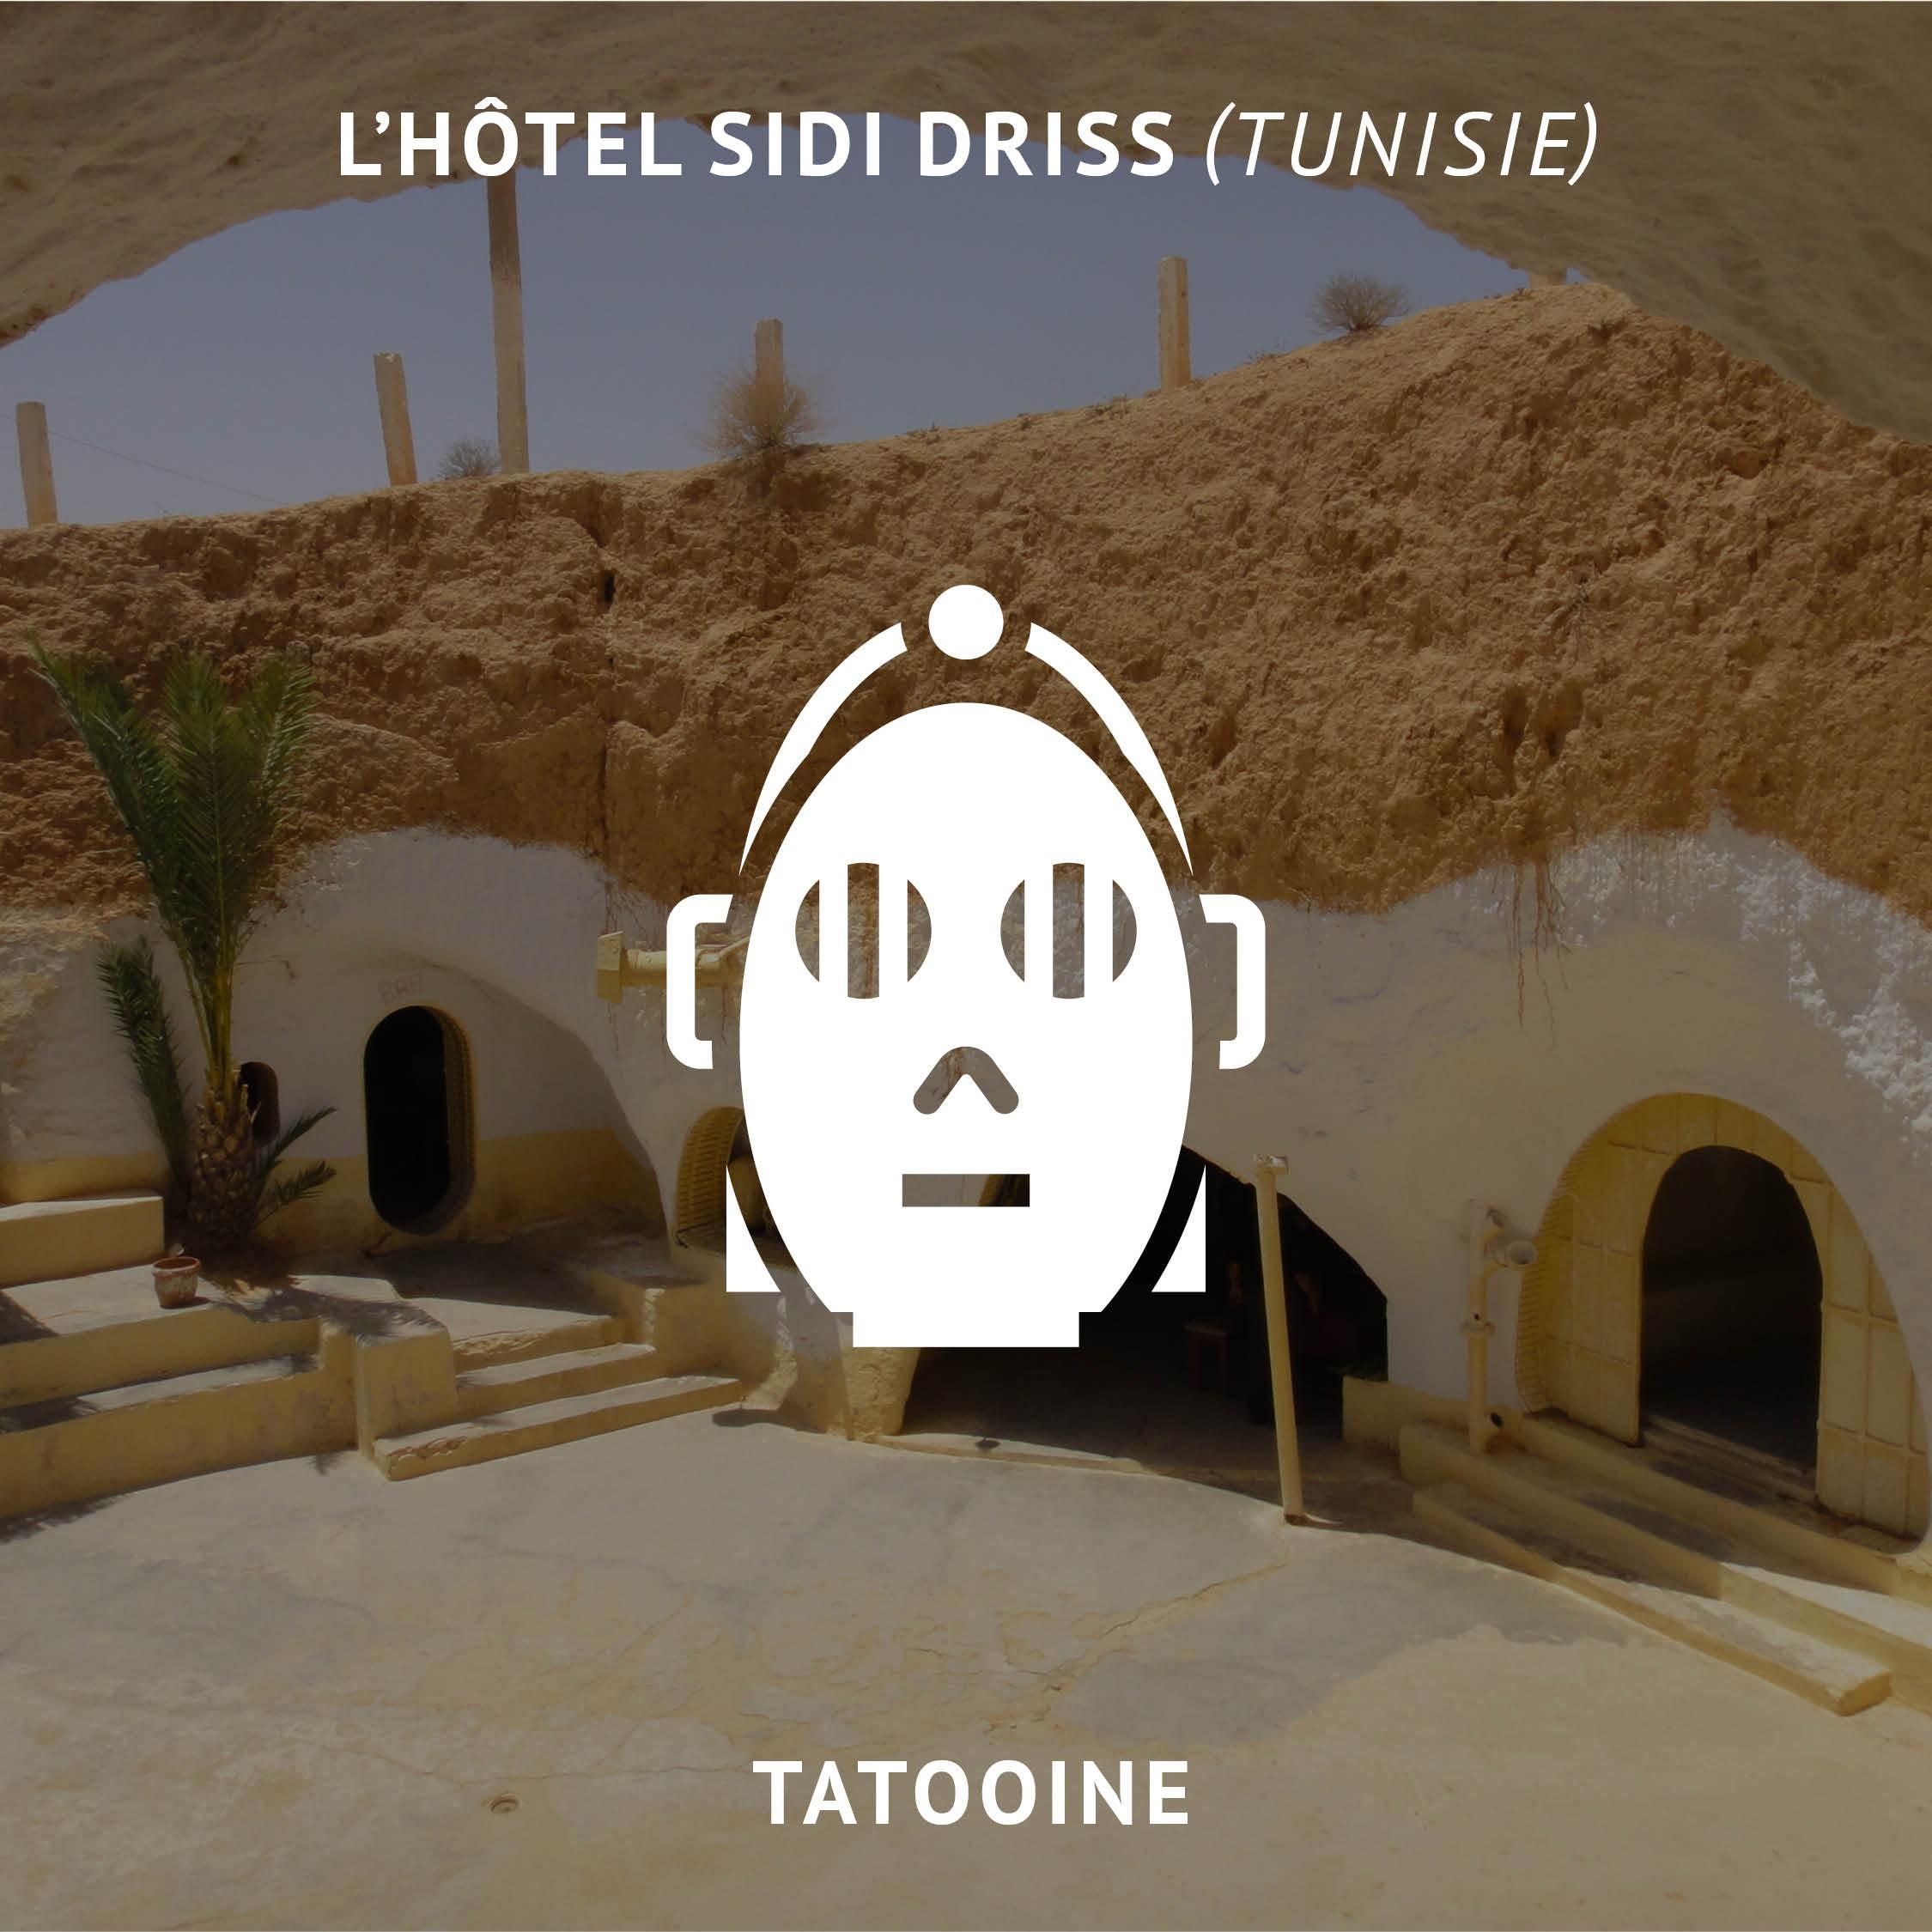 hôtel Sidi Driss en Tunisie